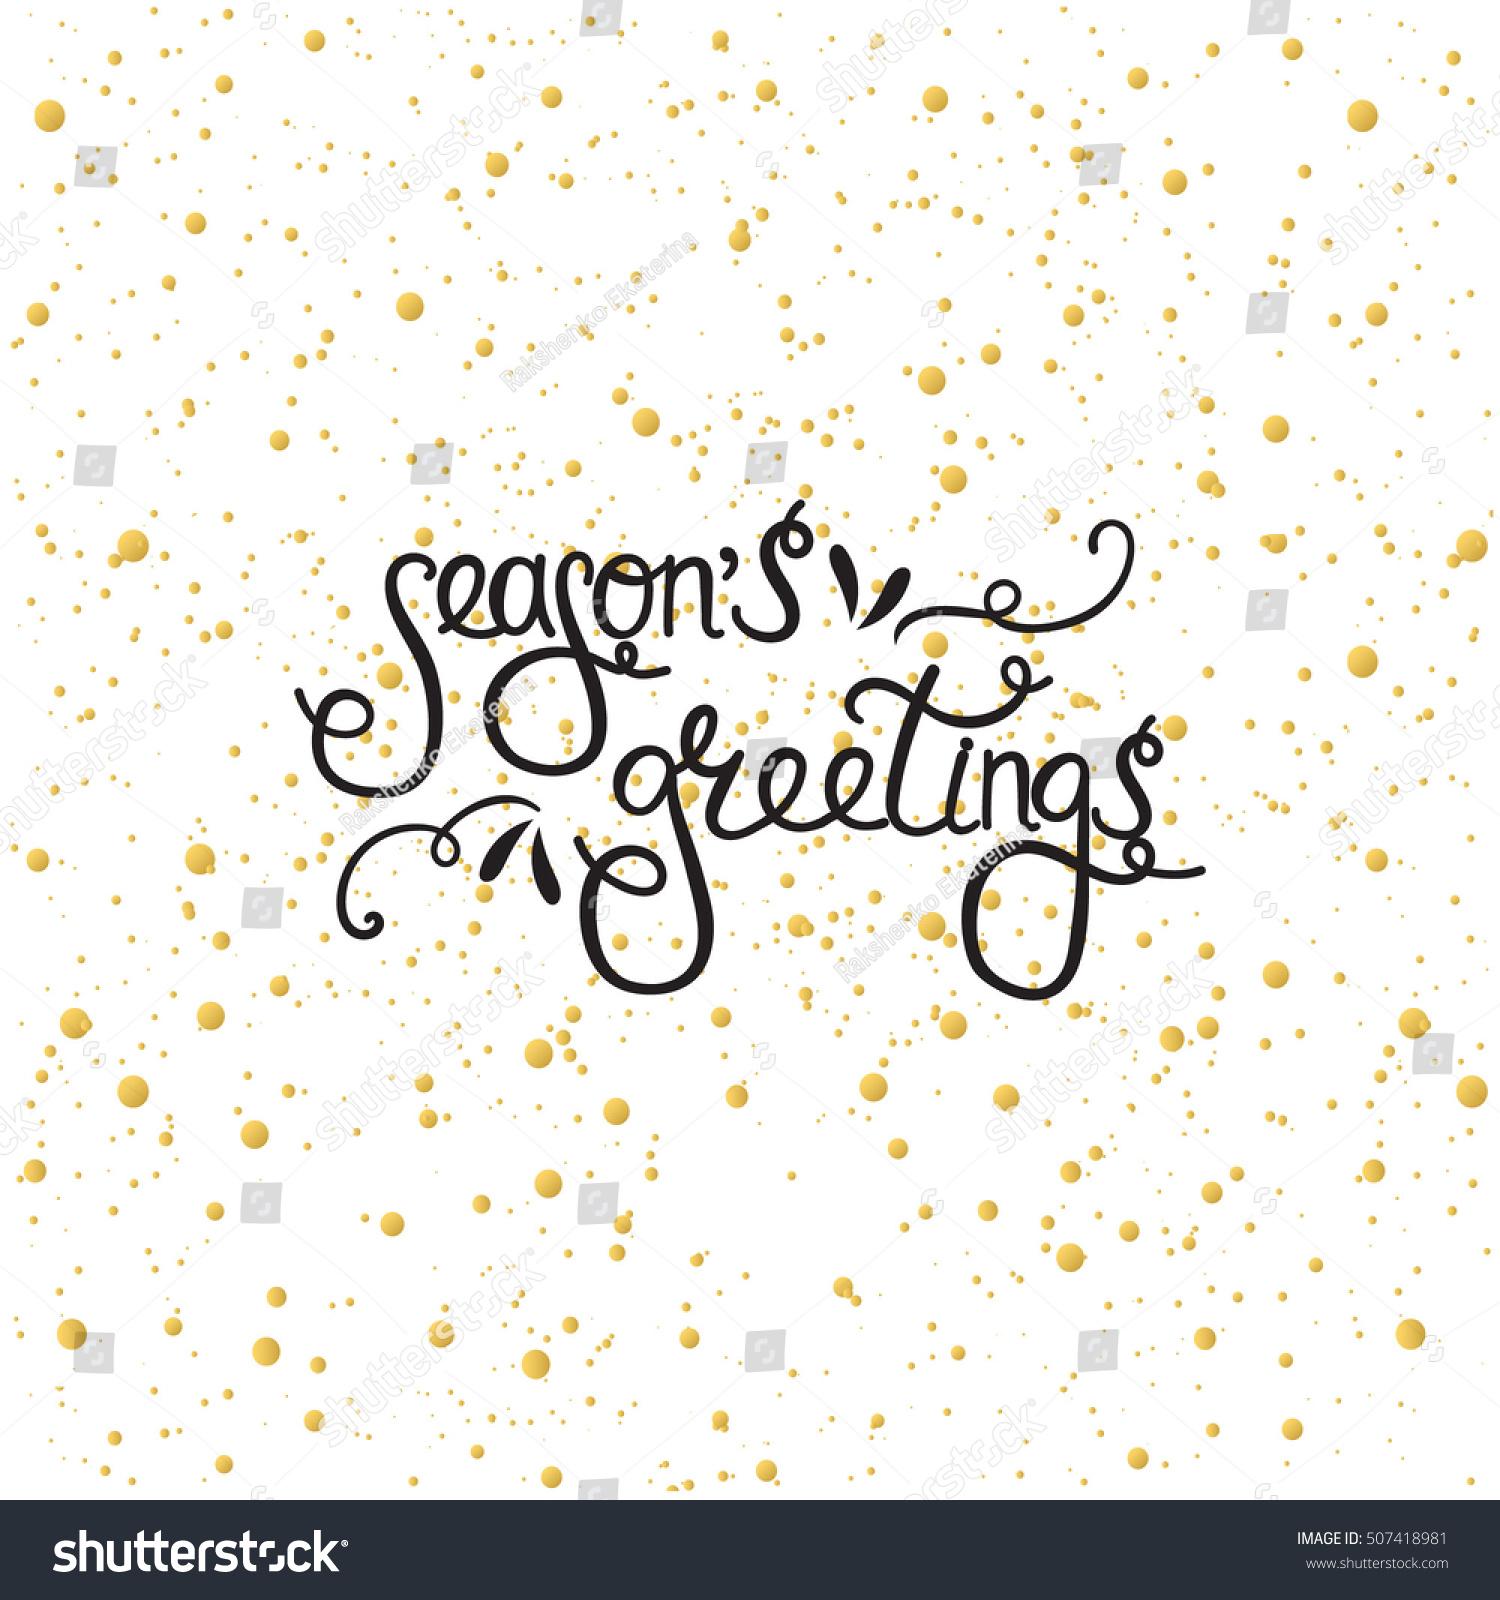 Handdrawn Lettering Seasons Greetings Design Christmas – Holiday or Seasons Greetings Invitation Cards